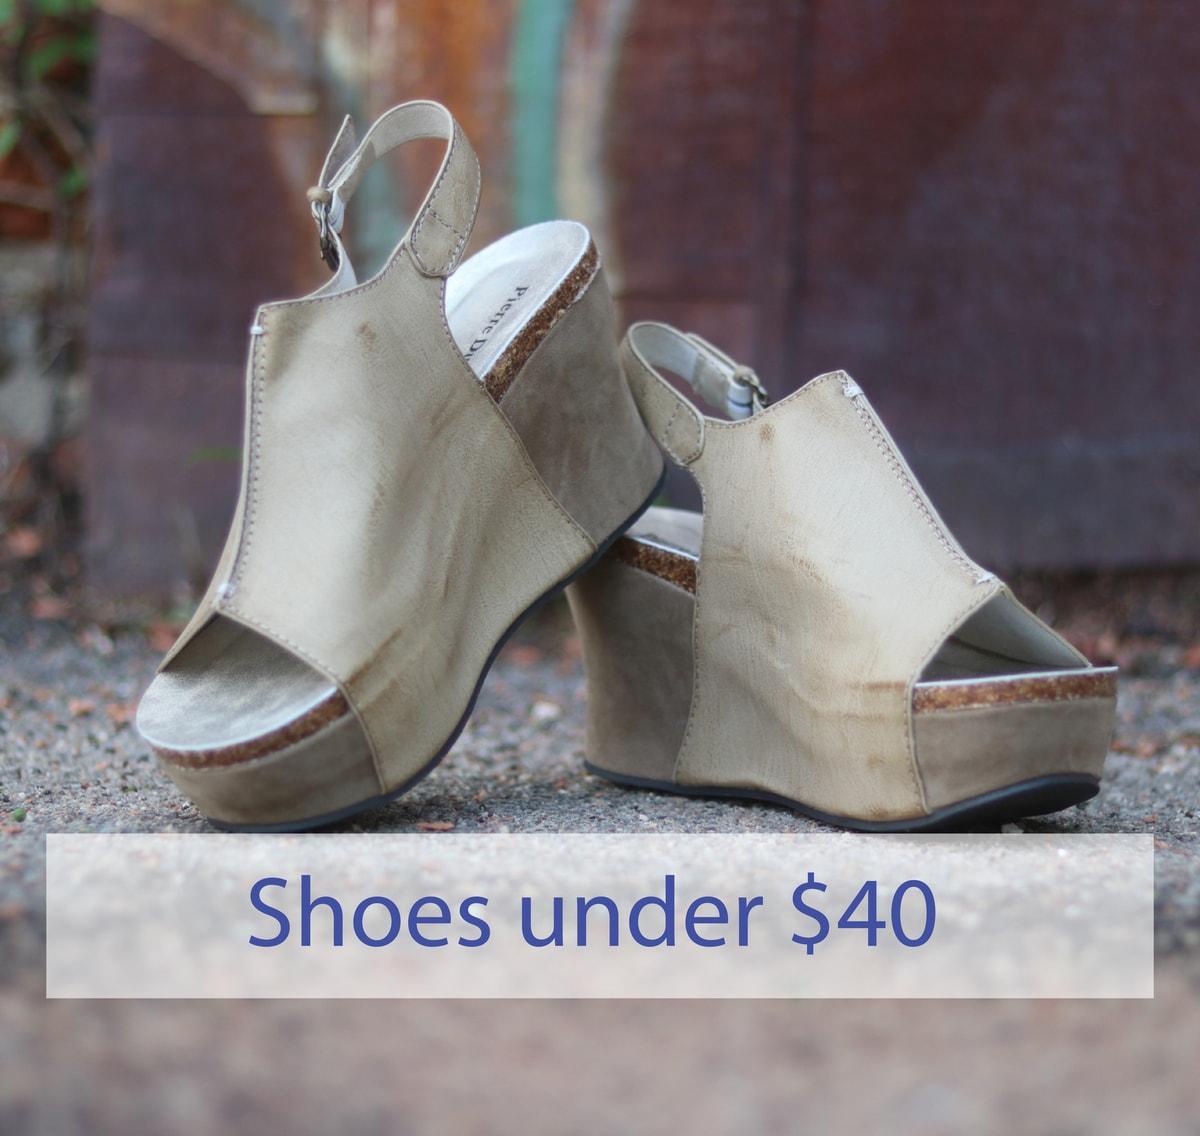 Shoes under 40